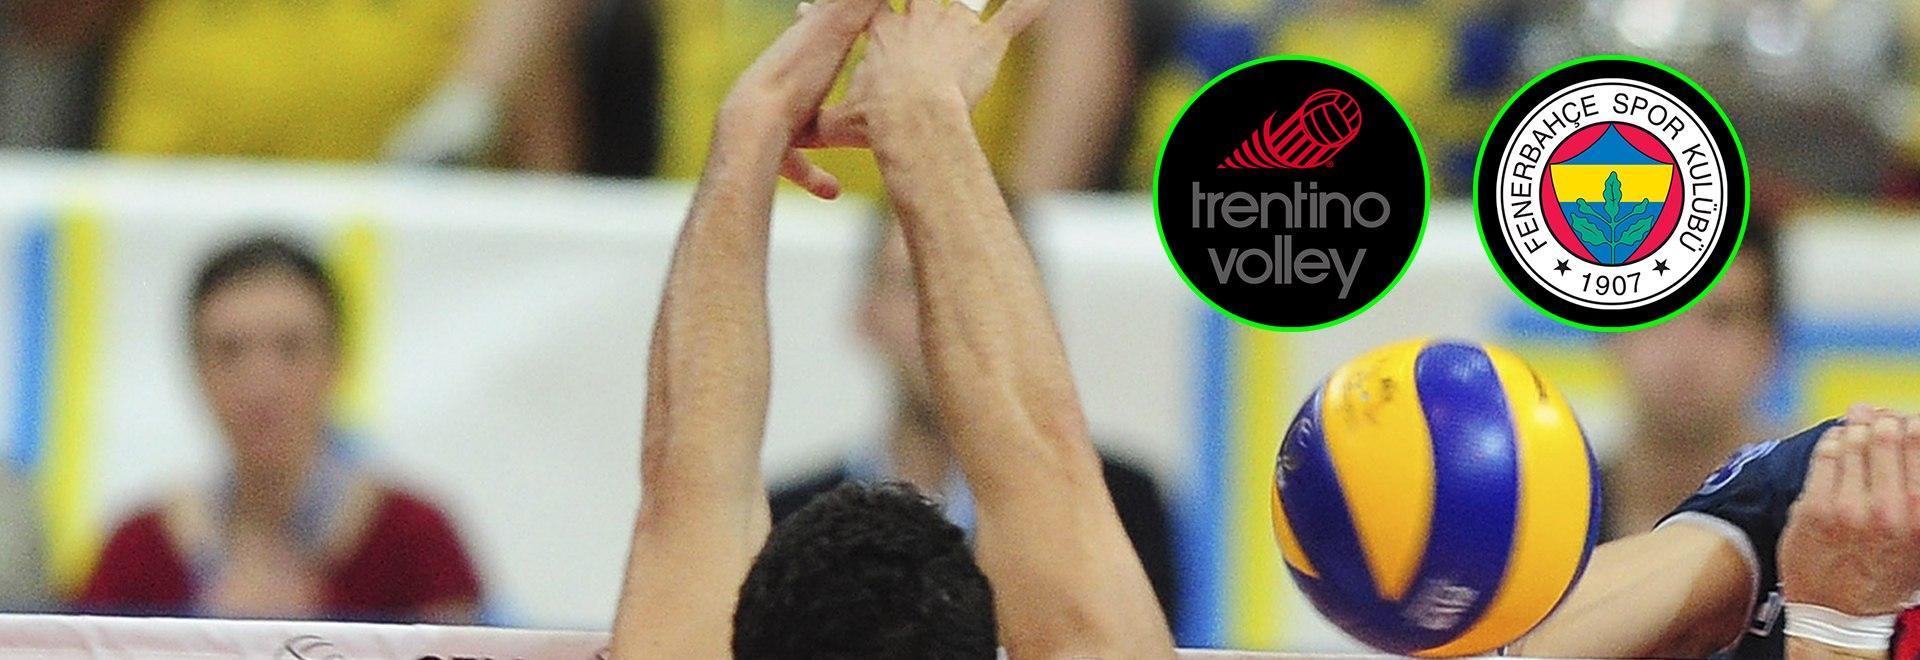 Trentino Volley - Fenerbahçe